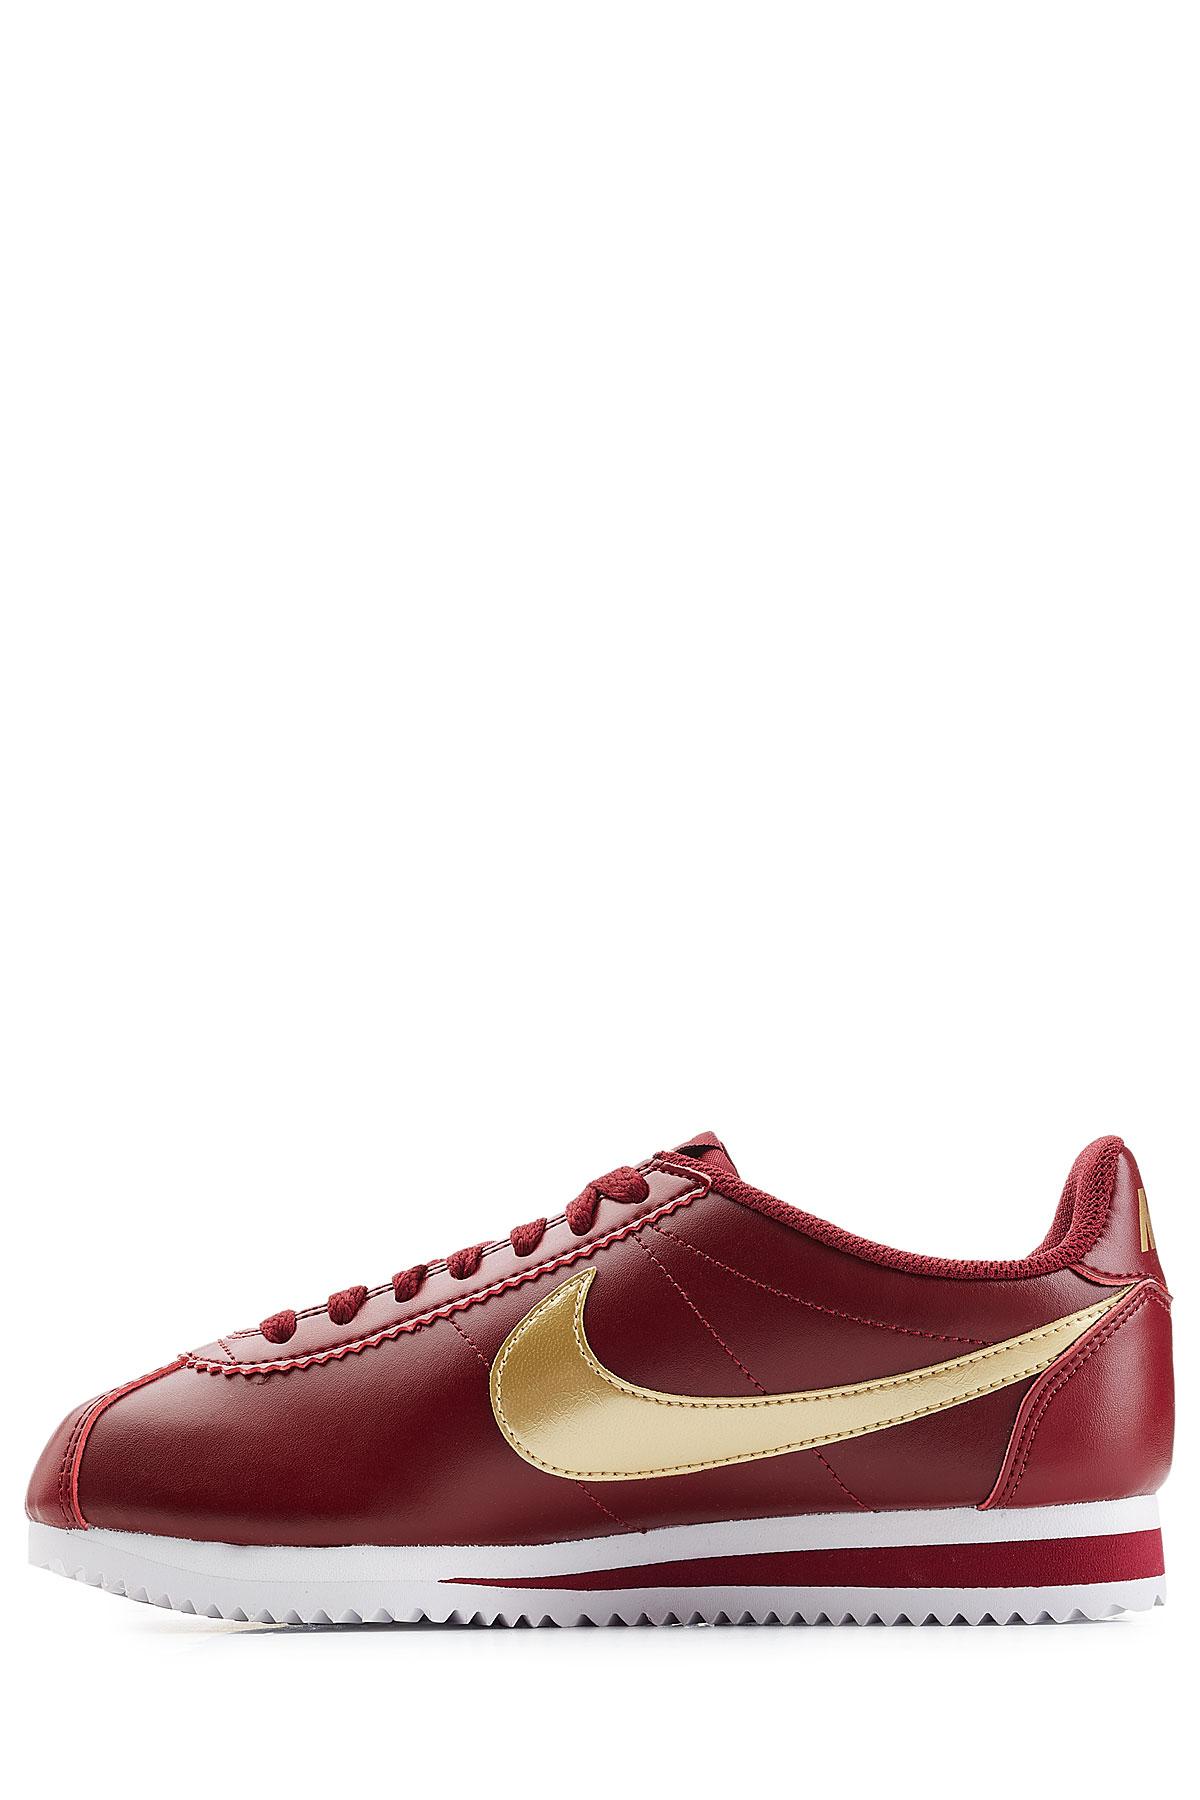 Nike Cortez Bordeau